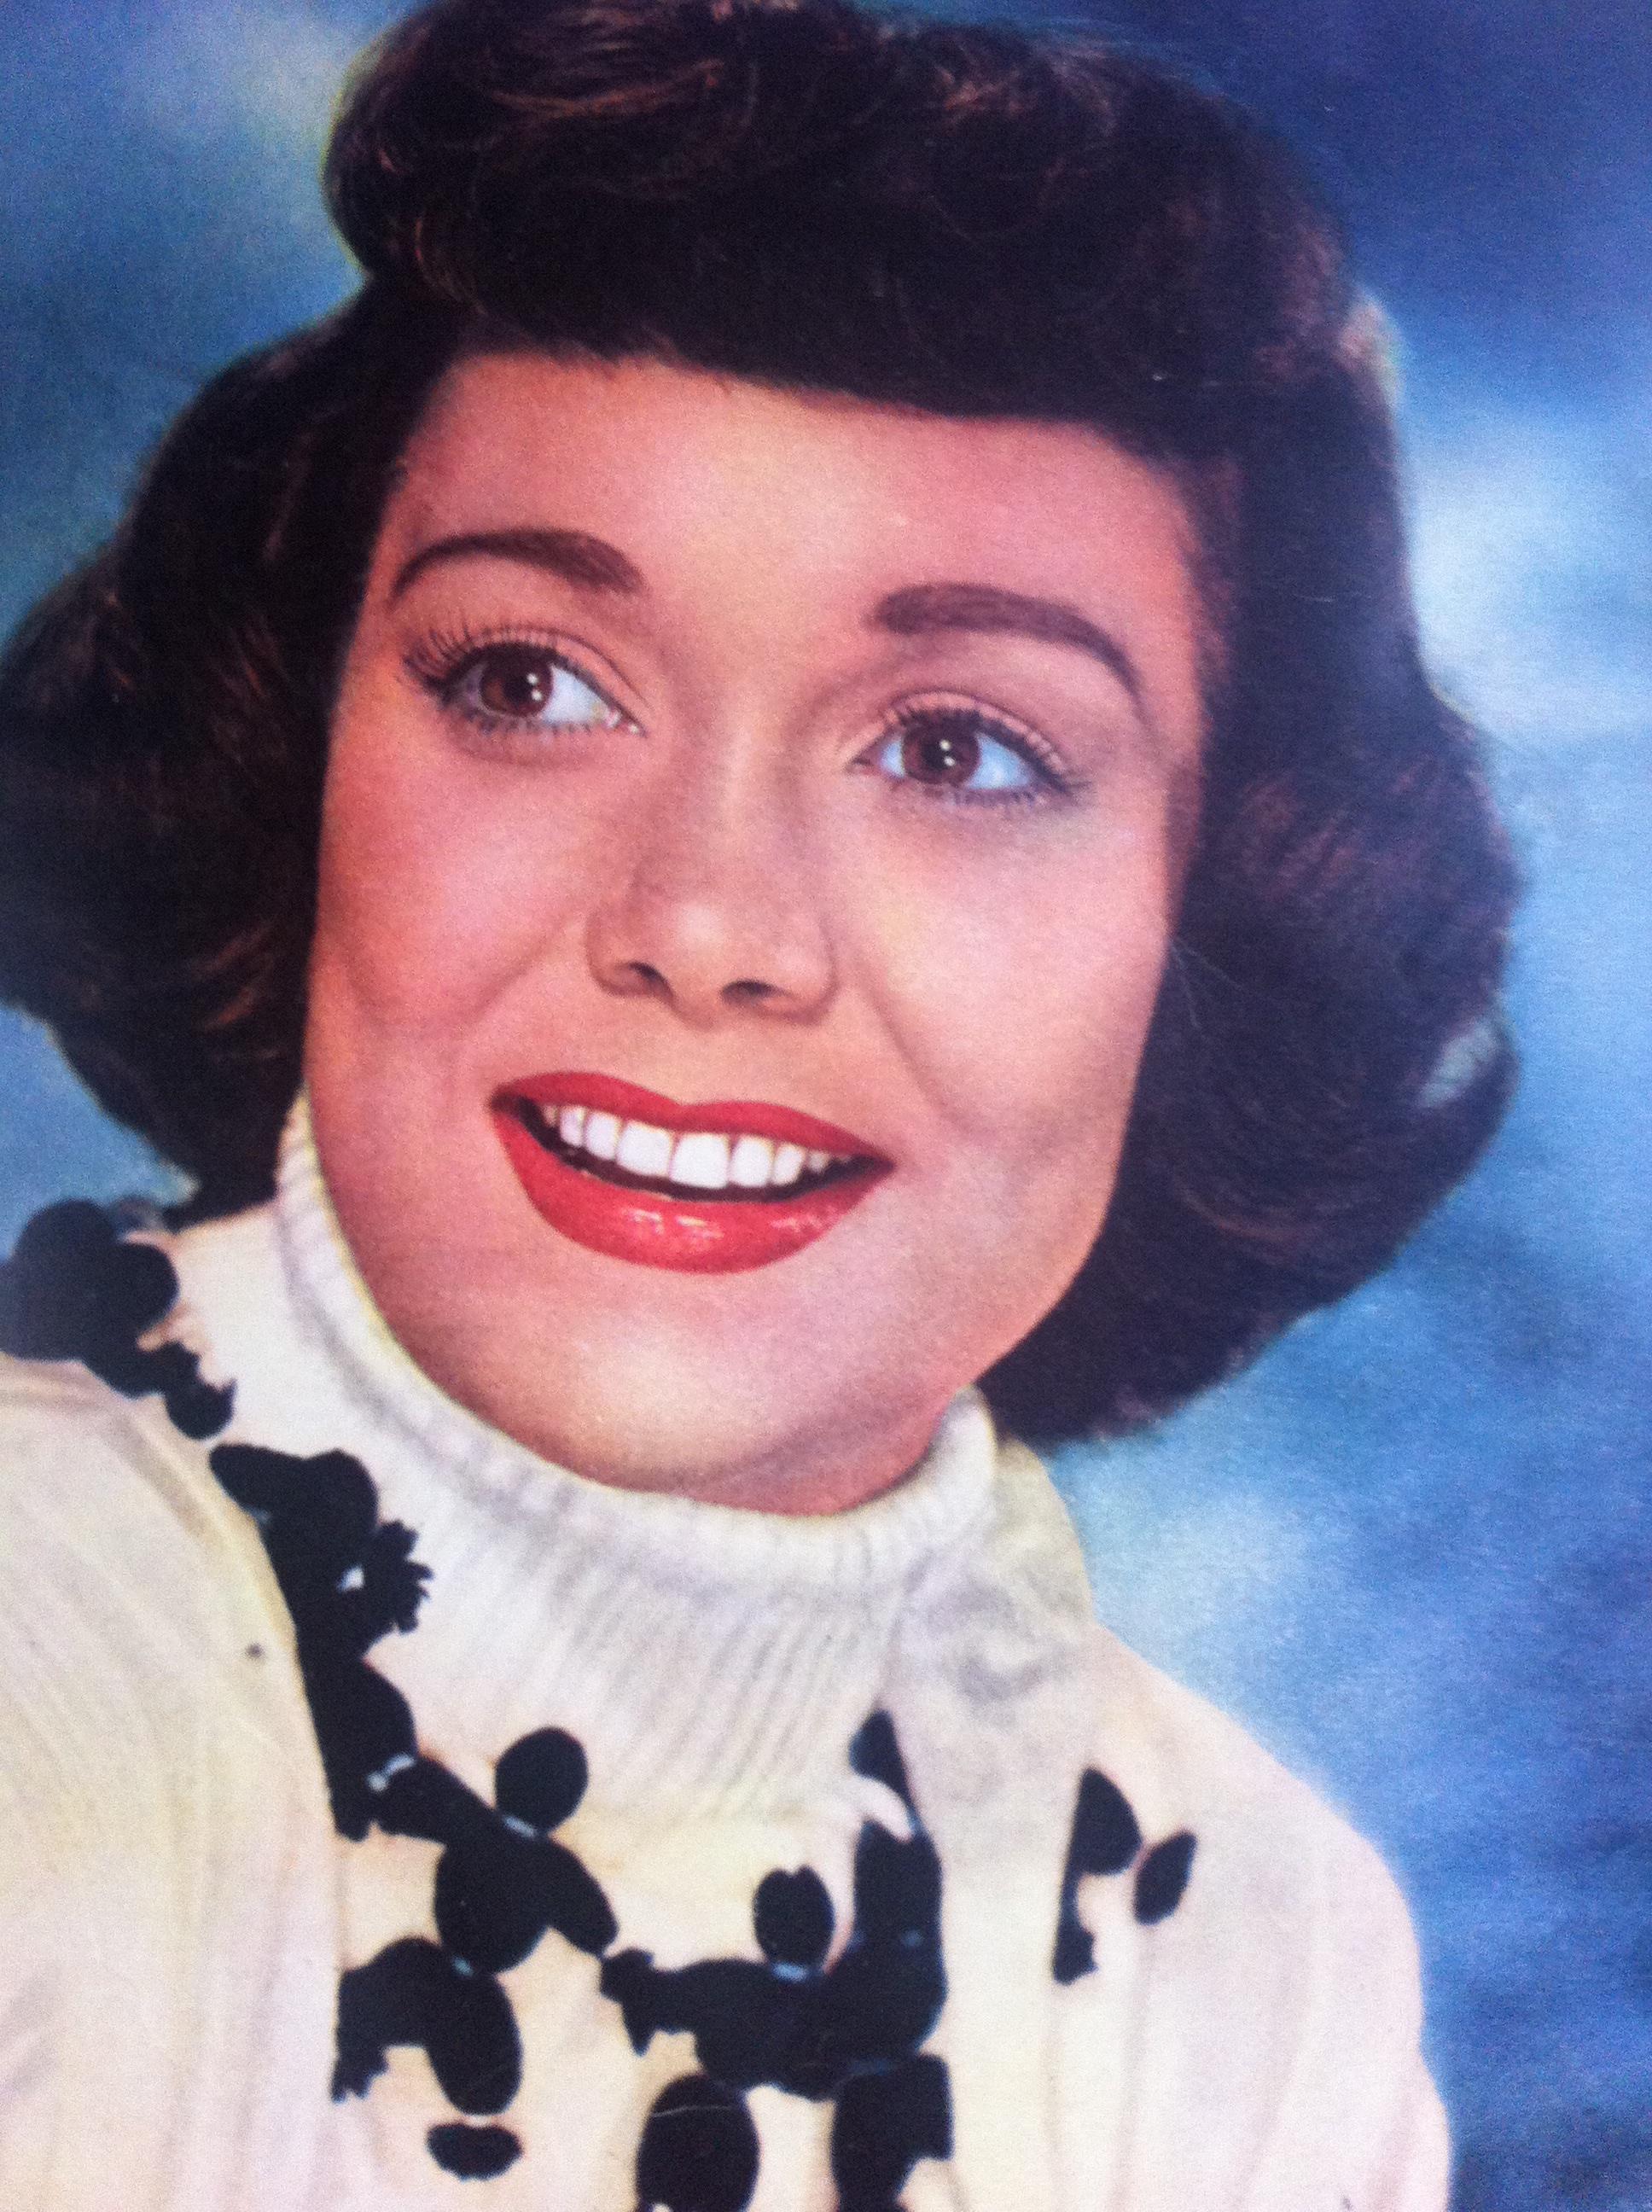 Jane Wyman in Johnny Belinda (1948)